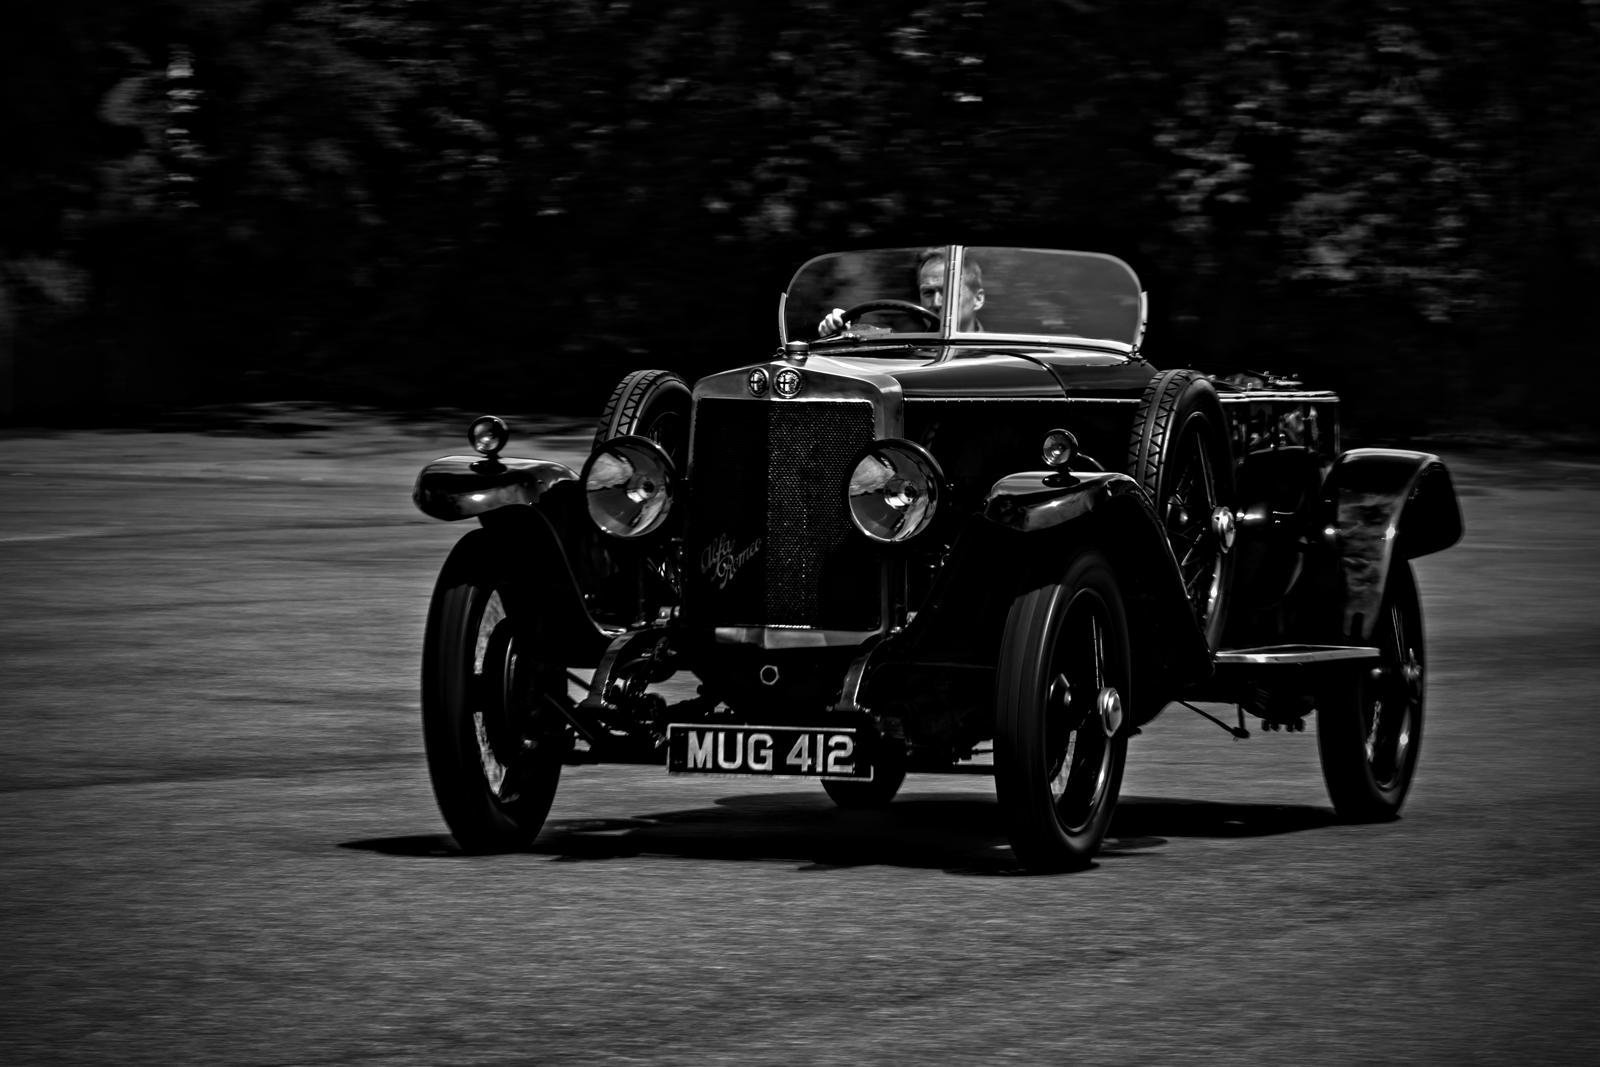 1925 Alfa Romeo RLSS driven by Kevin Kelly. Simeone Foundation Automotive Museum. Philadelphia, PA